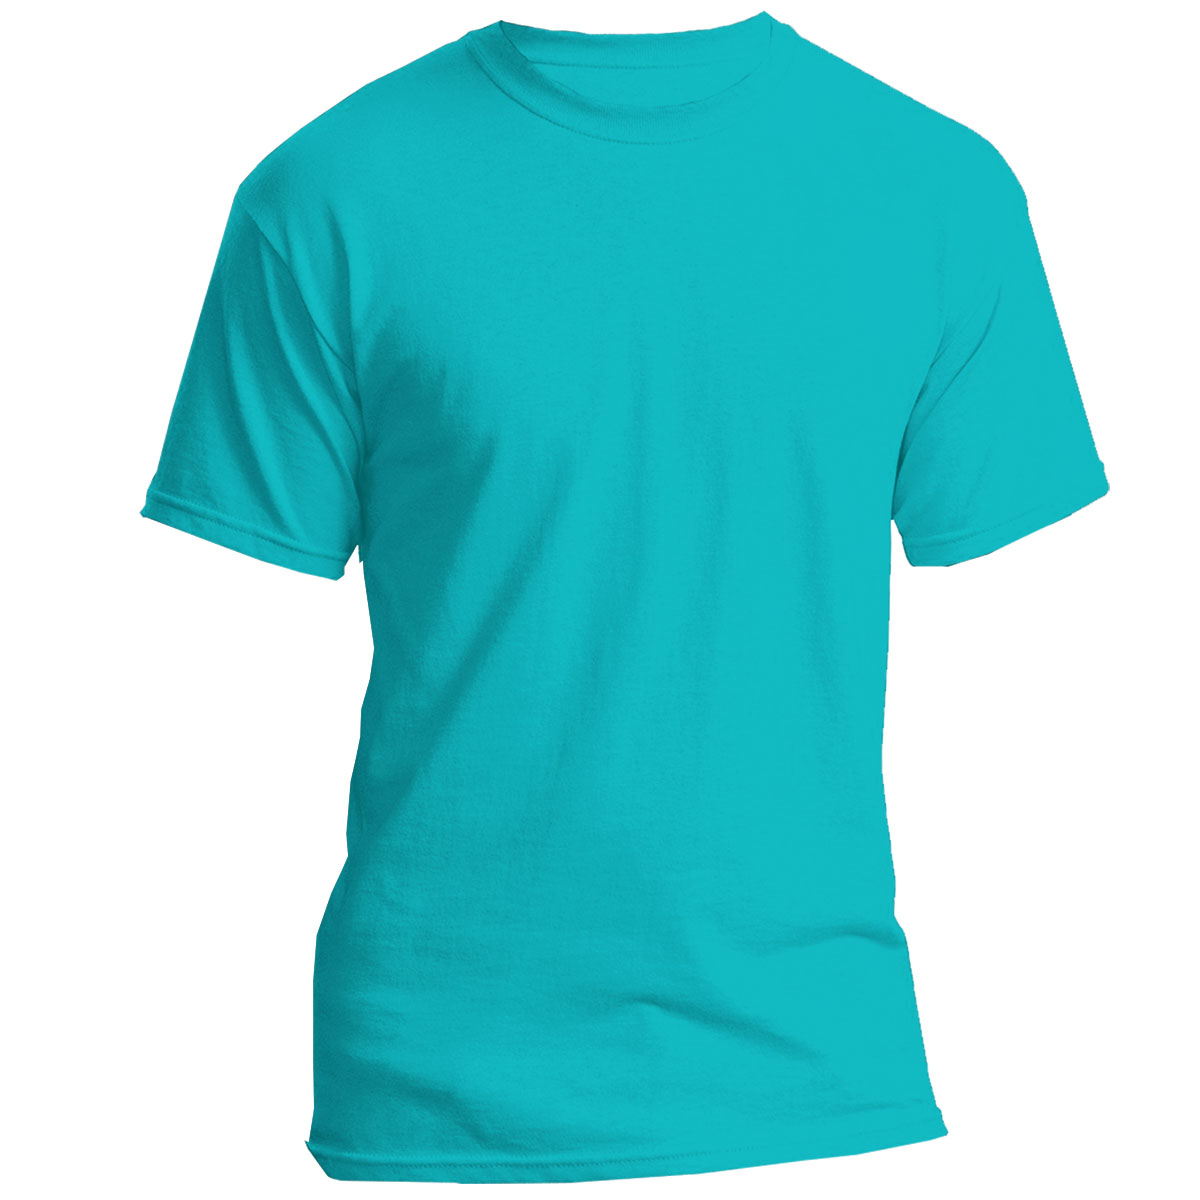 bbd54f5e42f4 Koszulka Regular Premium do nadruku Gramatura  190 g m² Rozmiar  M ...